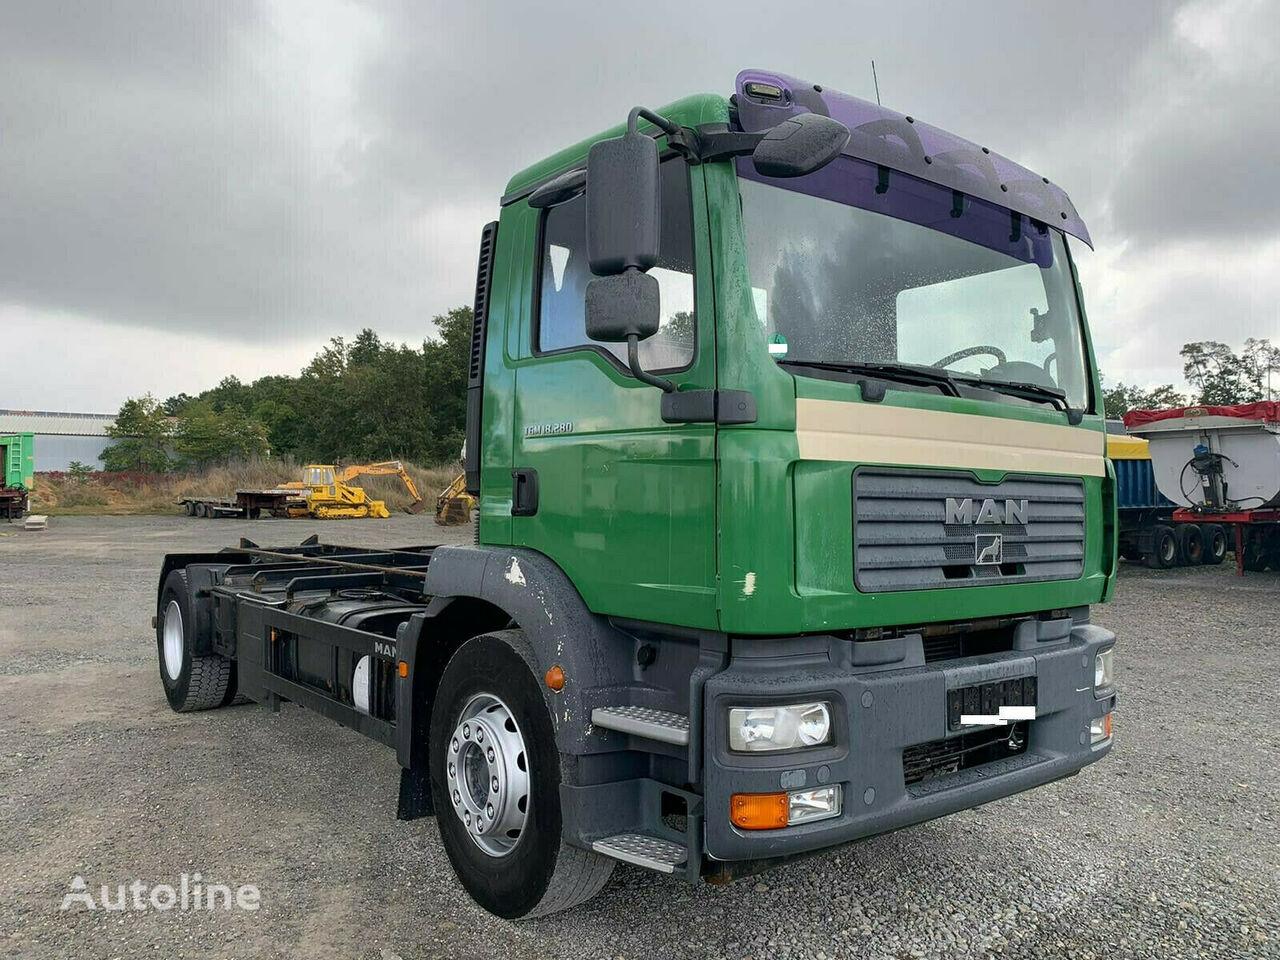 MAN Wechselfahrgestell TGM 18.280 4x2 ATL-Wechselsystem Fahrgestell LKW